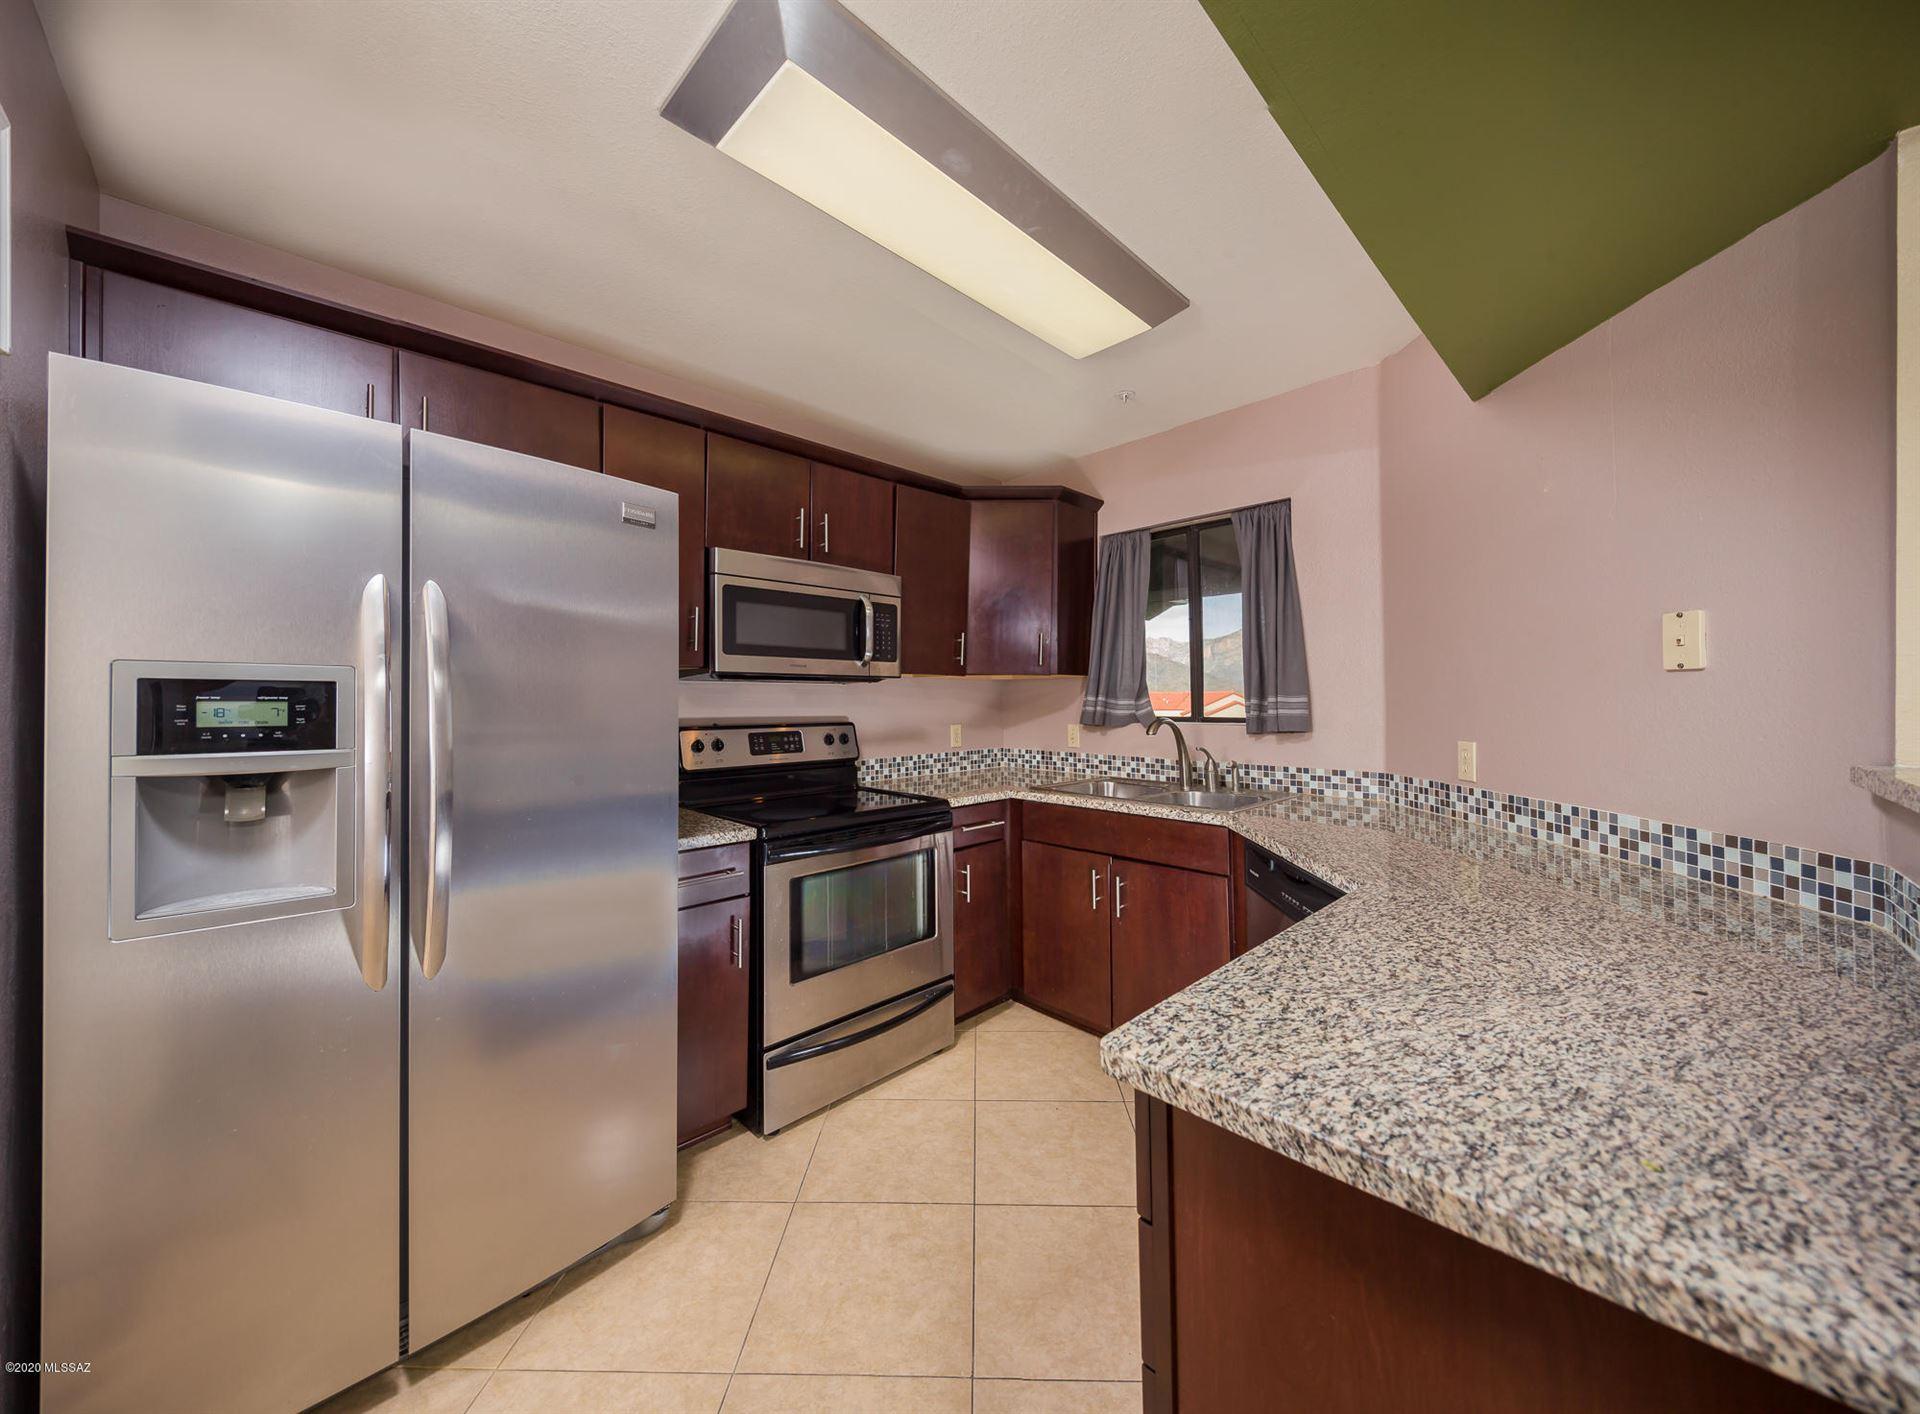 5751 N Kolb Road #32201, Tucson, AZ 85750 - MLS#: 22009537